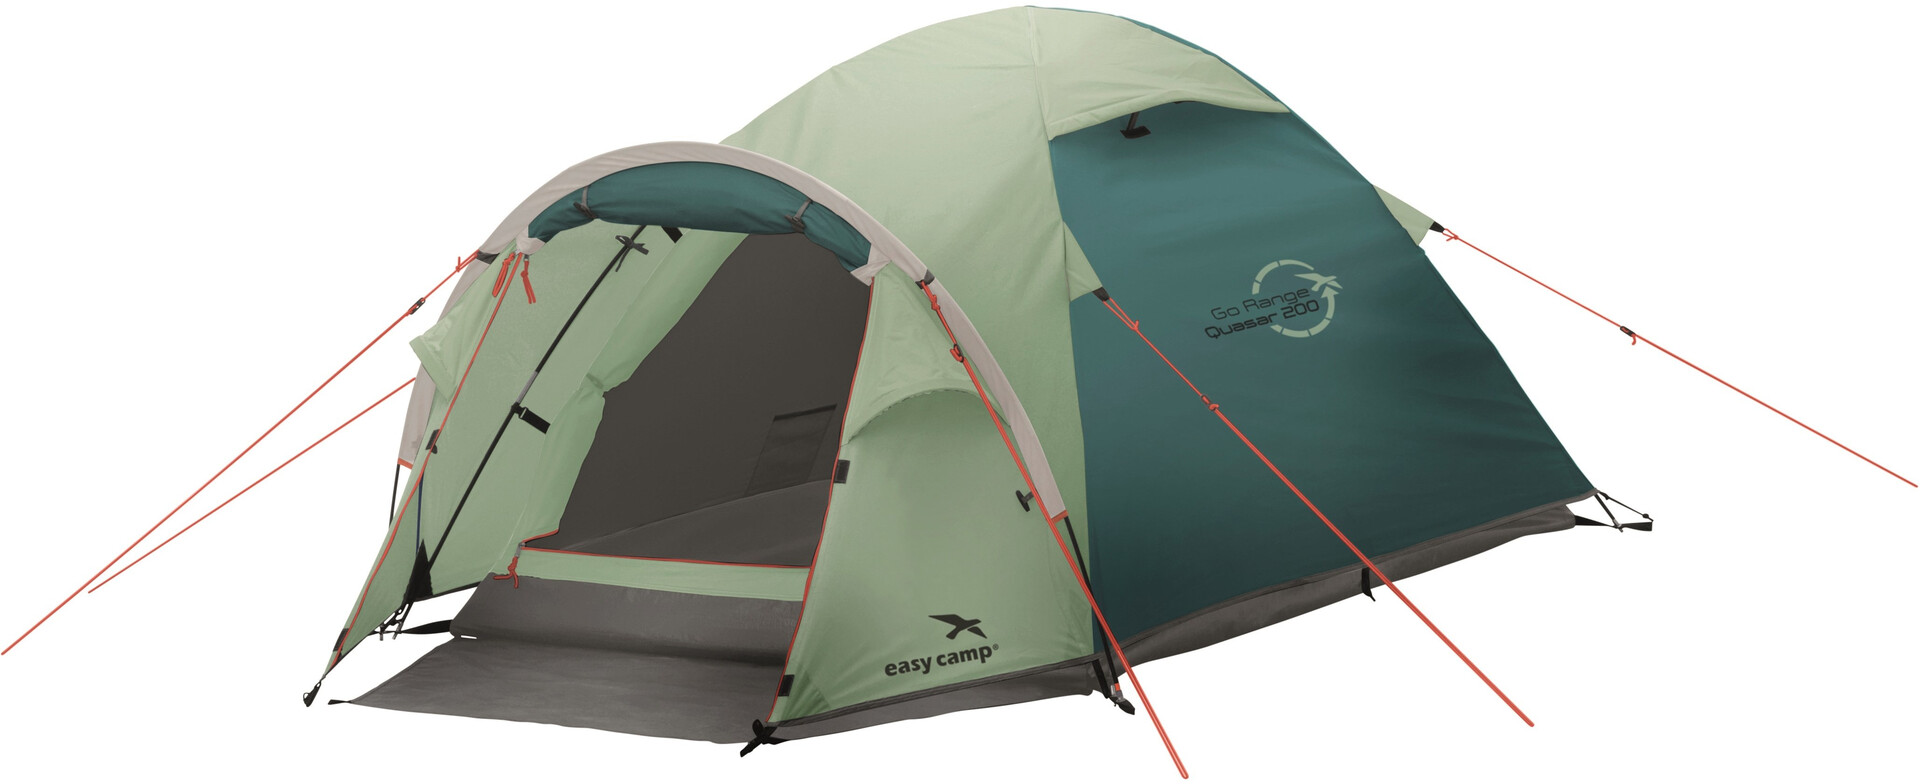 Easy Camp Quasar 200 Tent turquoise | Gode tilbud hos